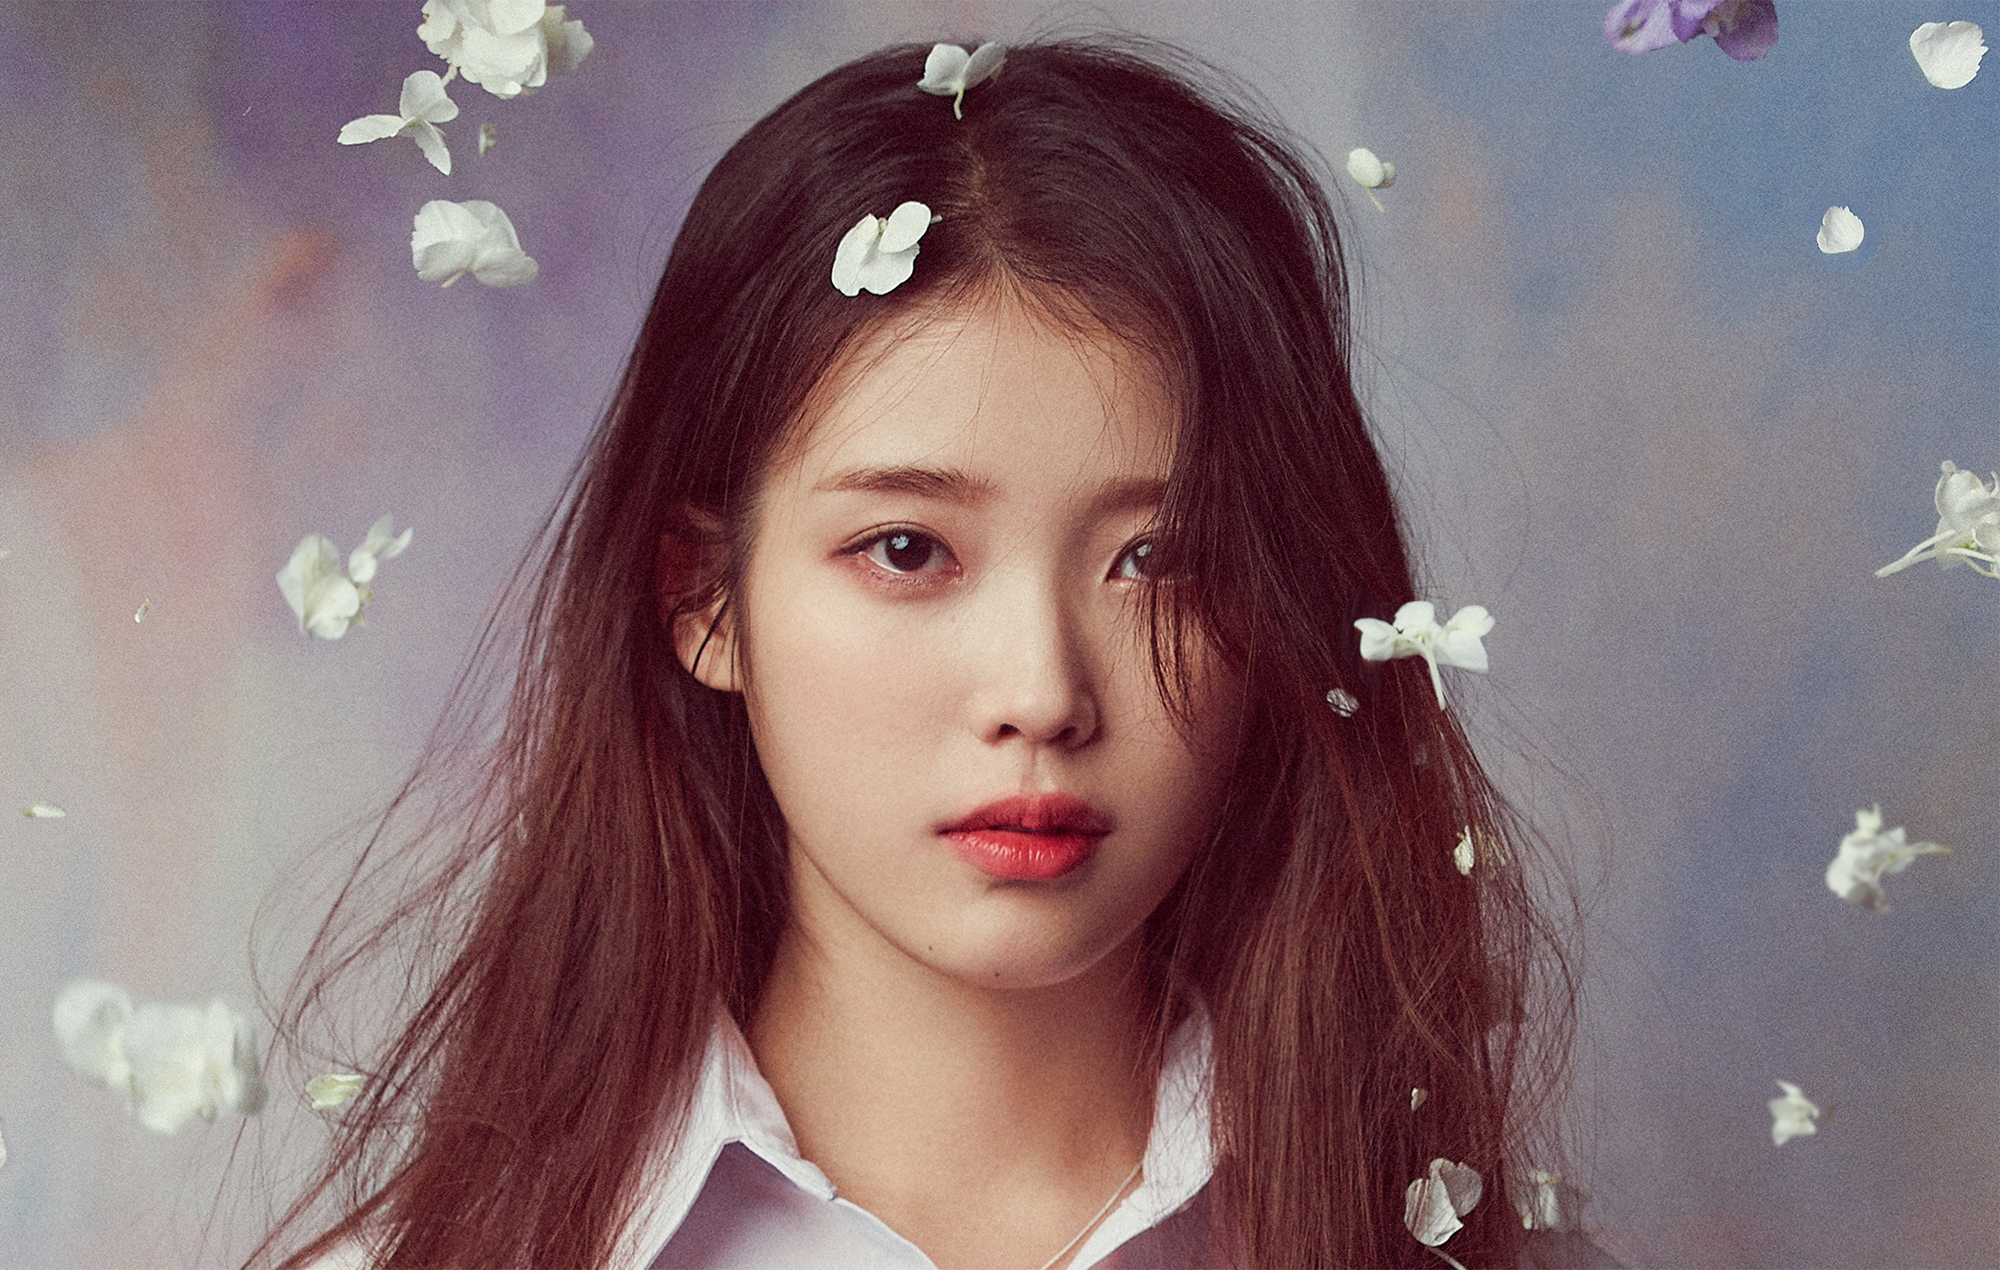 IU confirms new album title and release date에 대한 갤러리